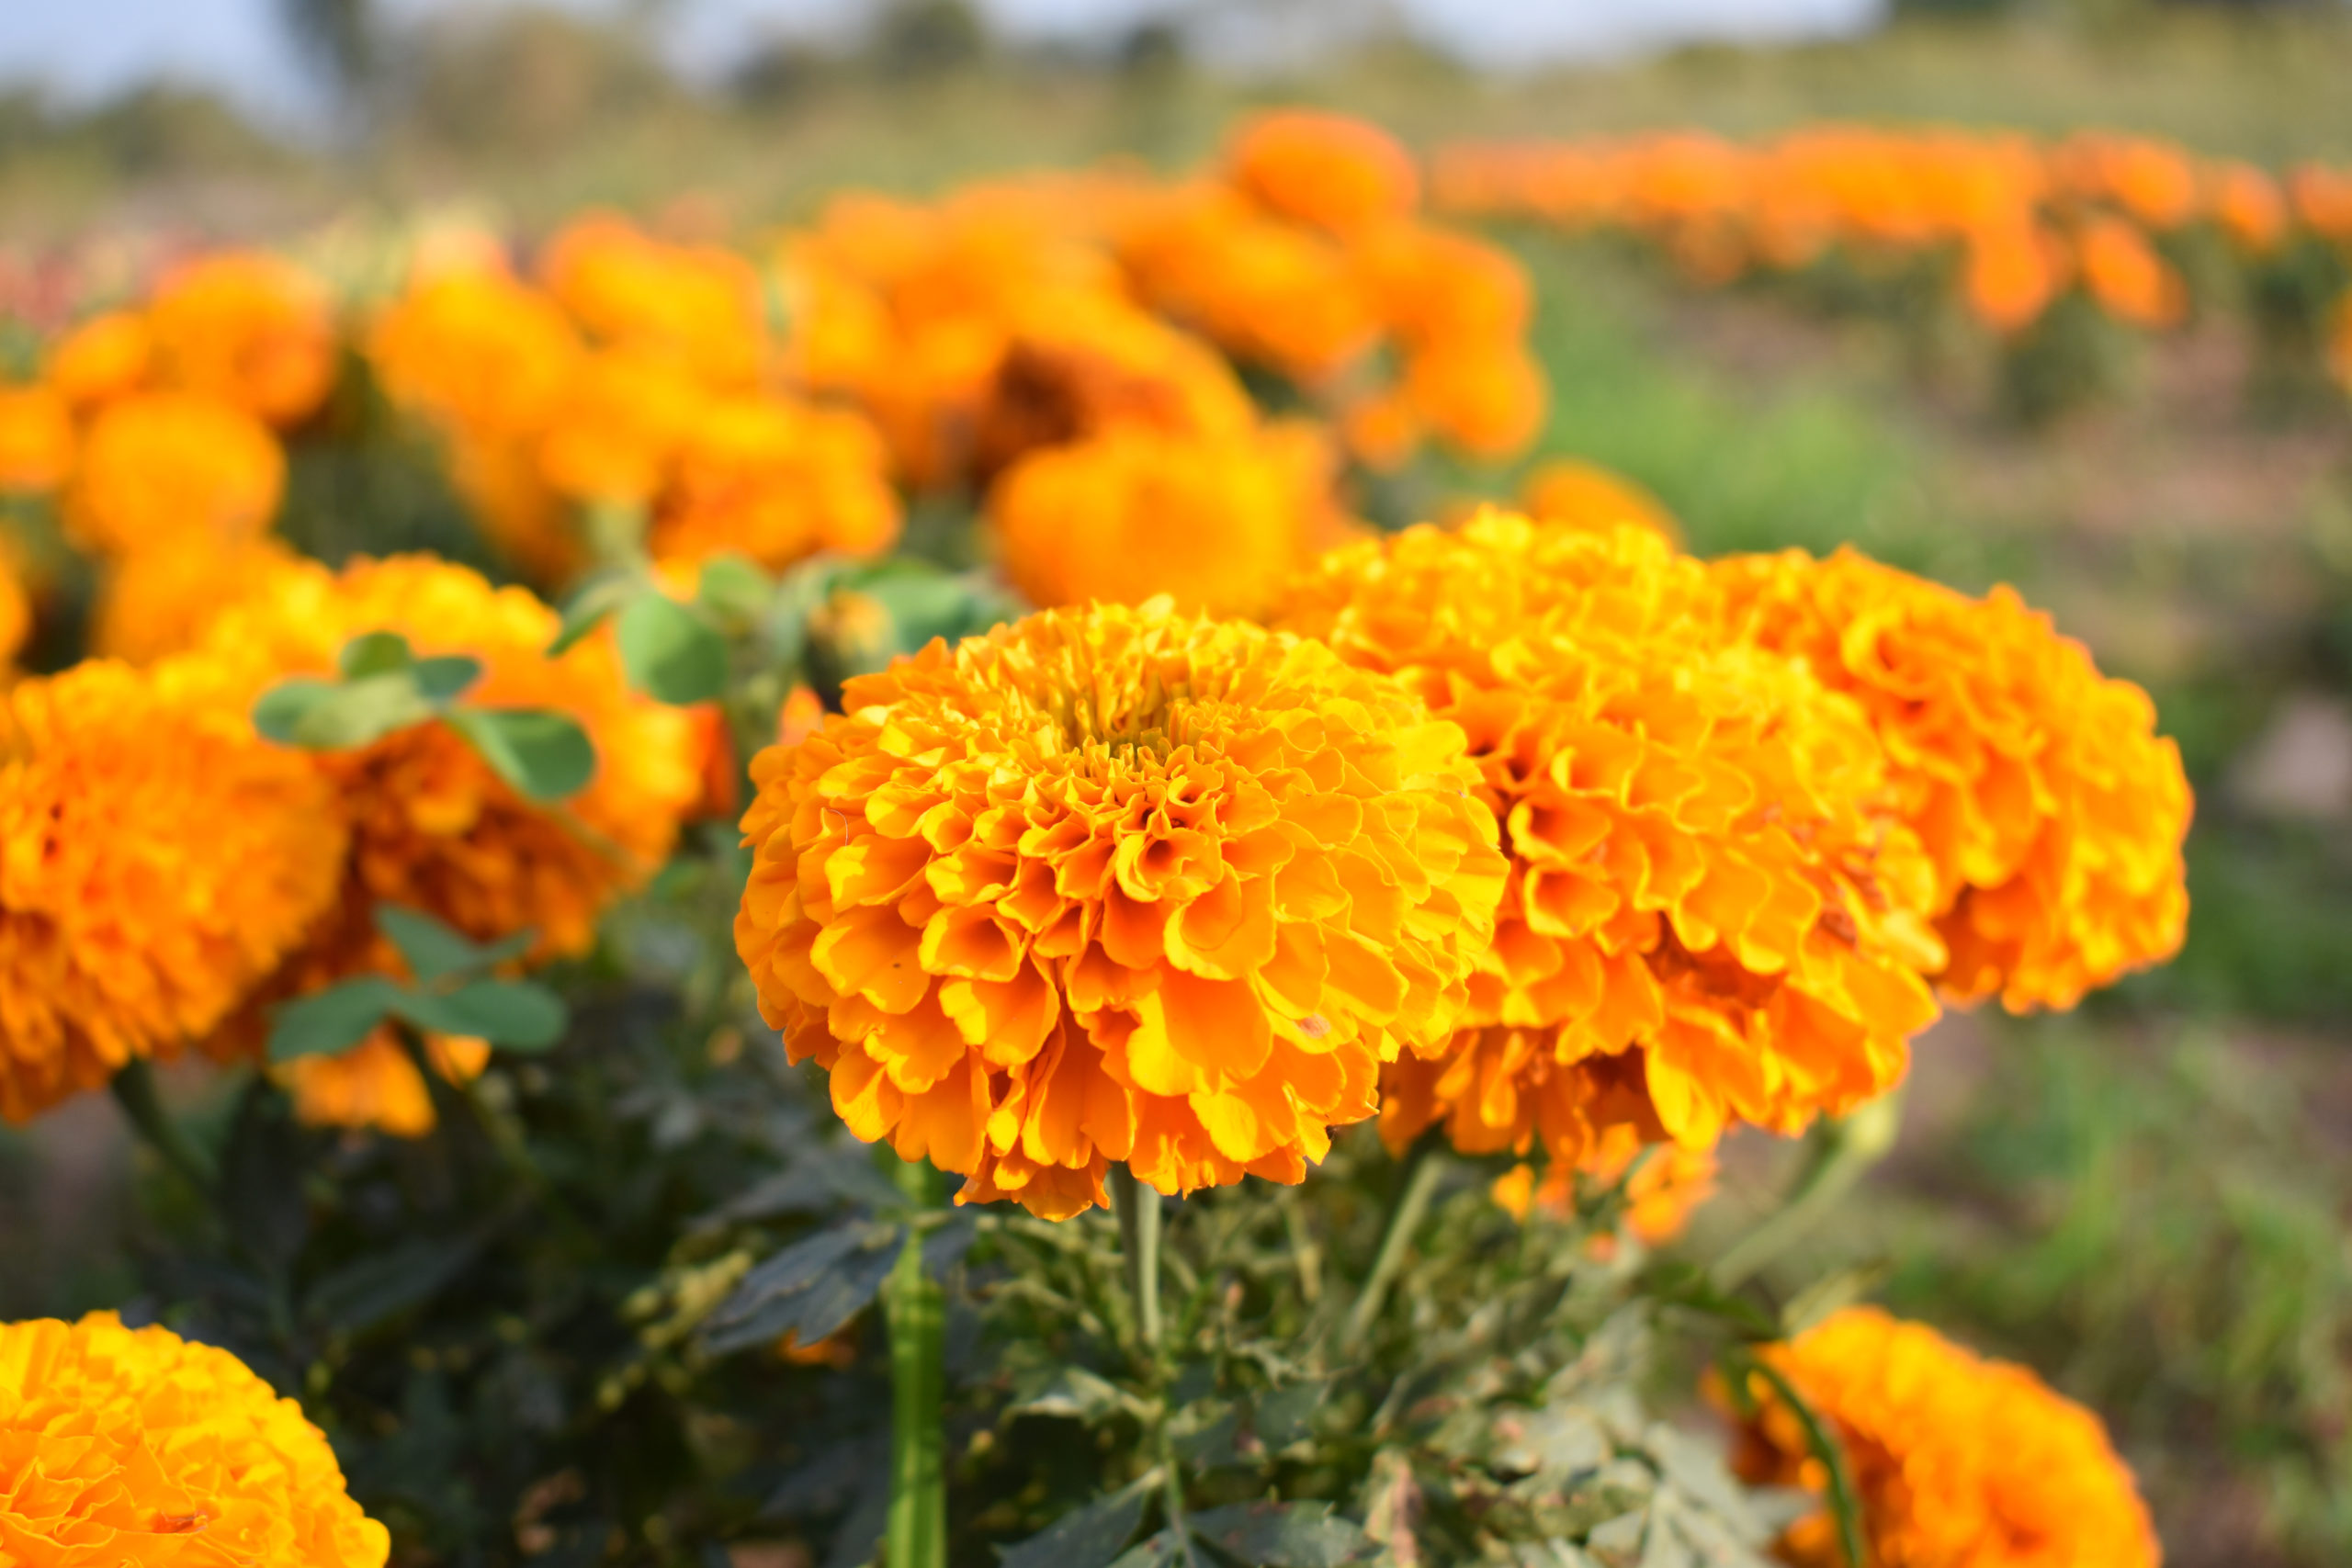 Closeup of Marigolds